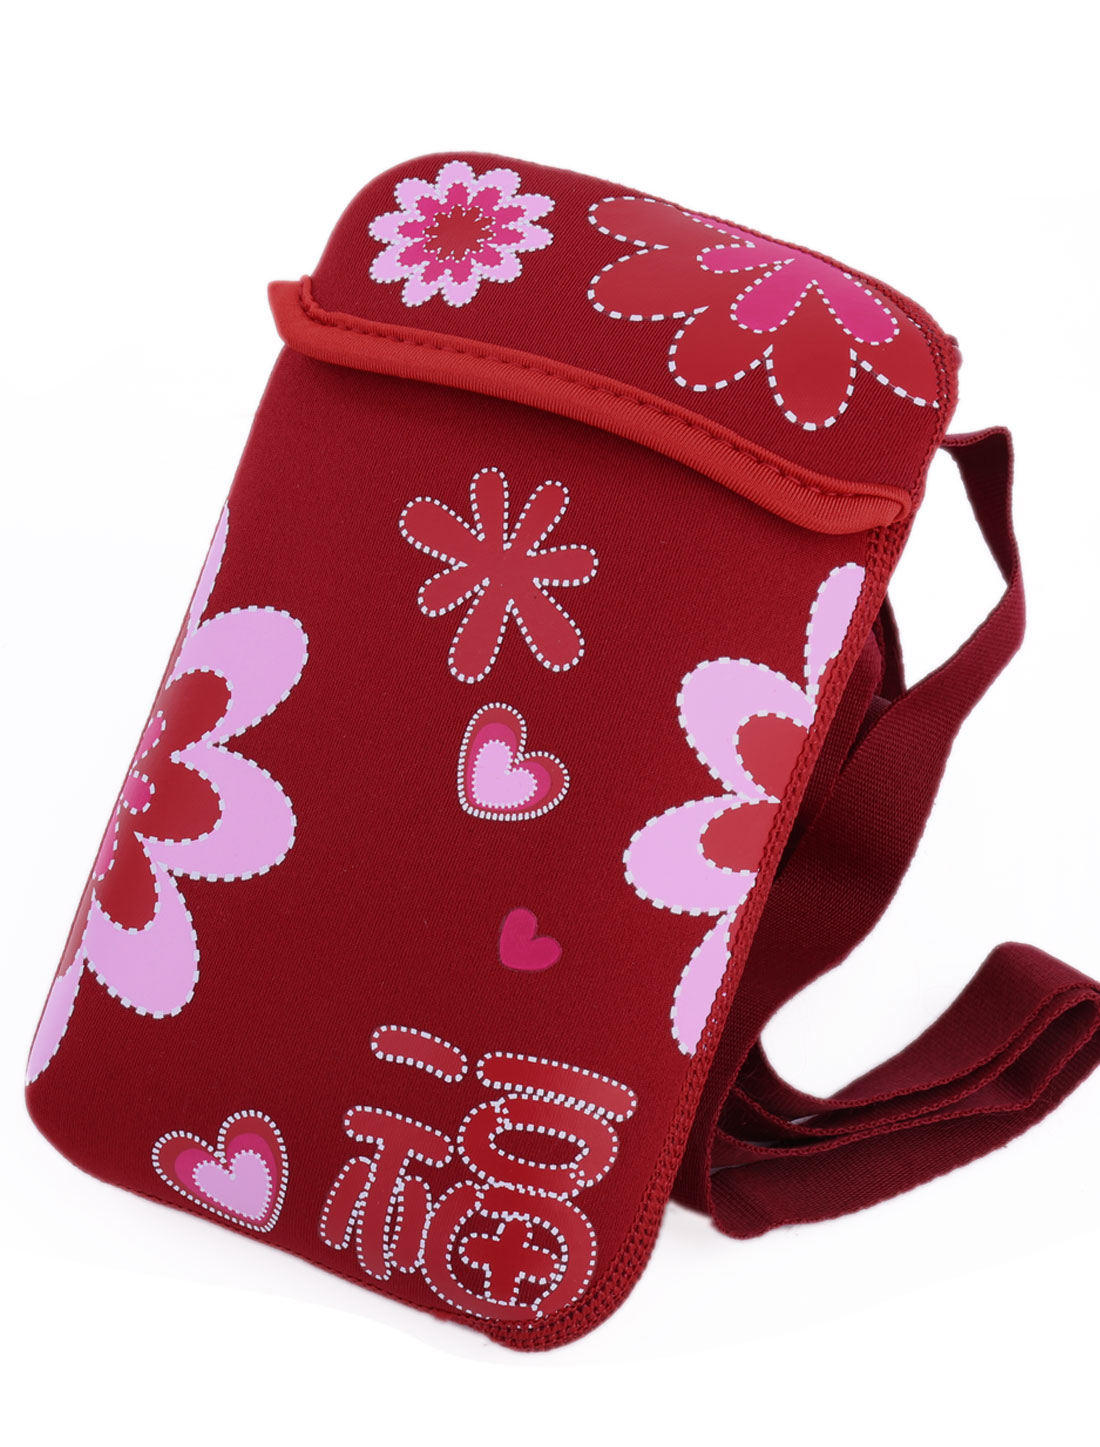 Girls-Chinese-Characters-Prints-Cute-Cross-Body-Bag